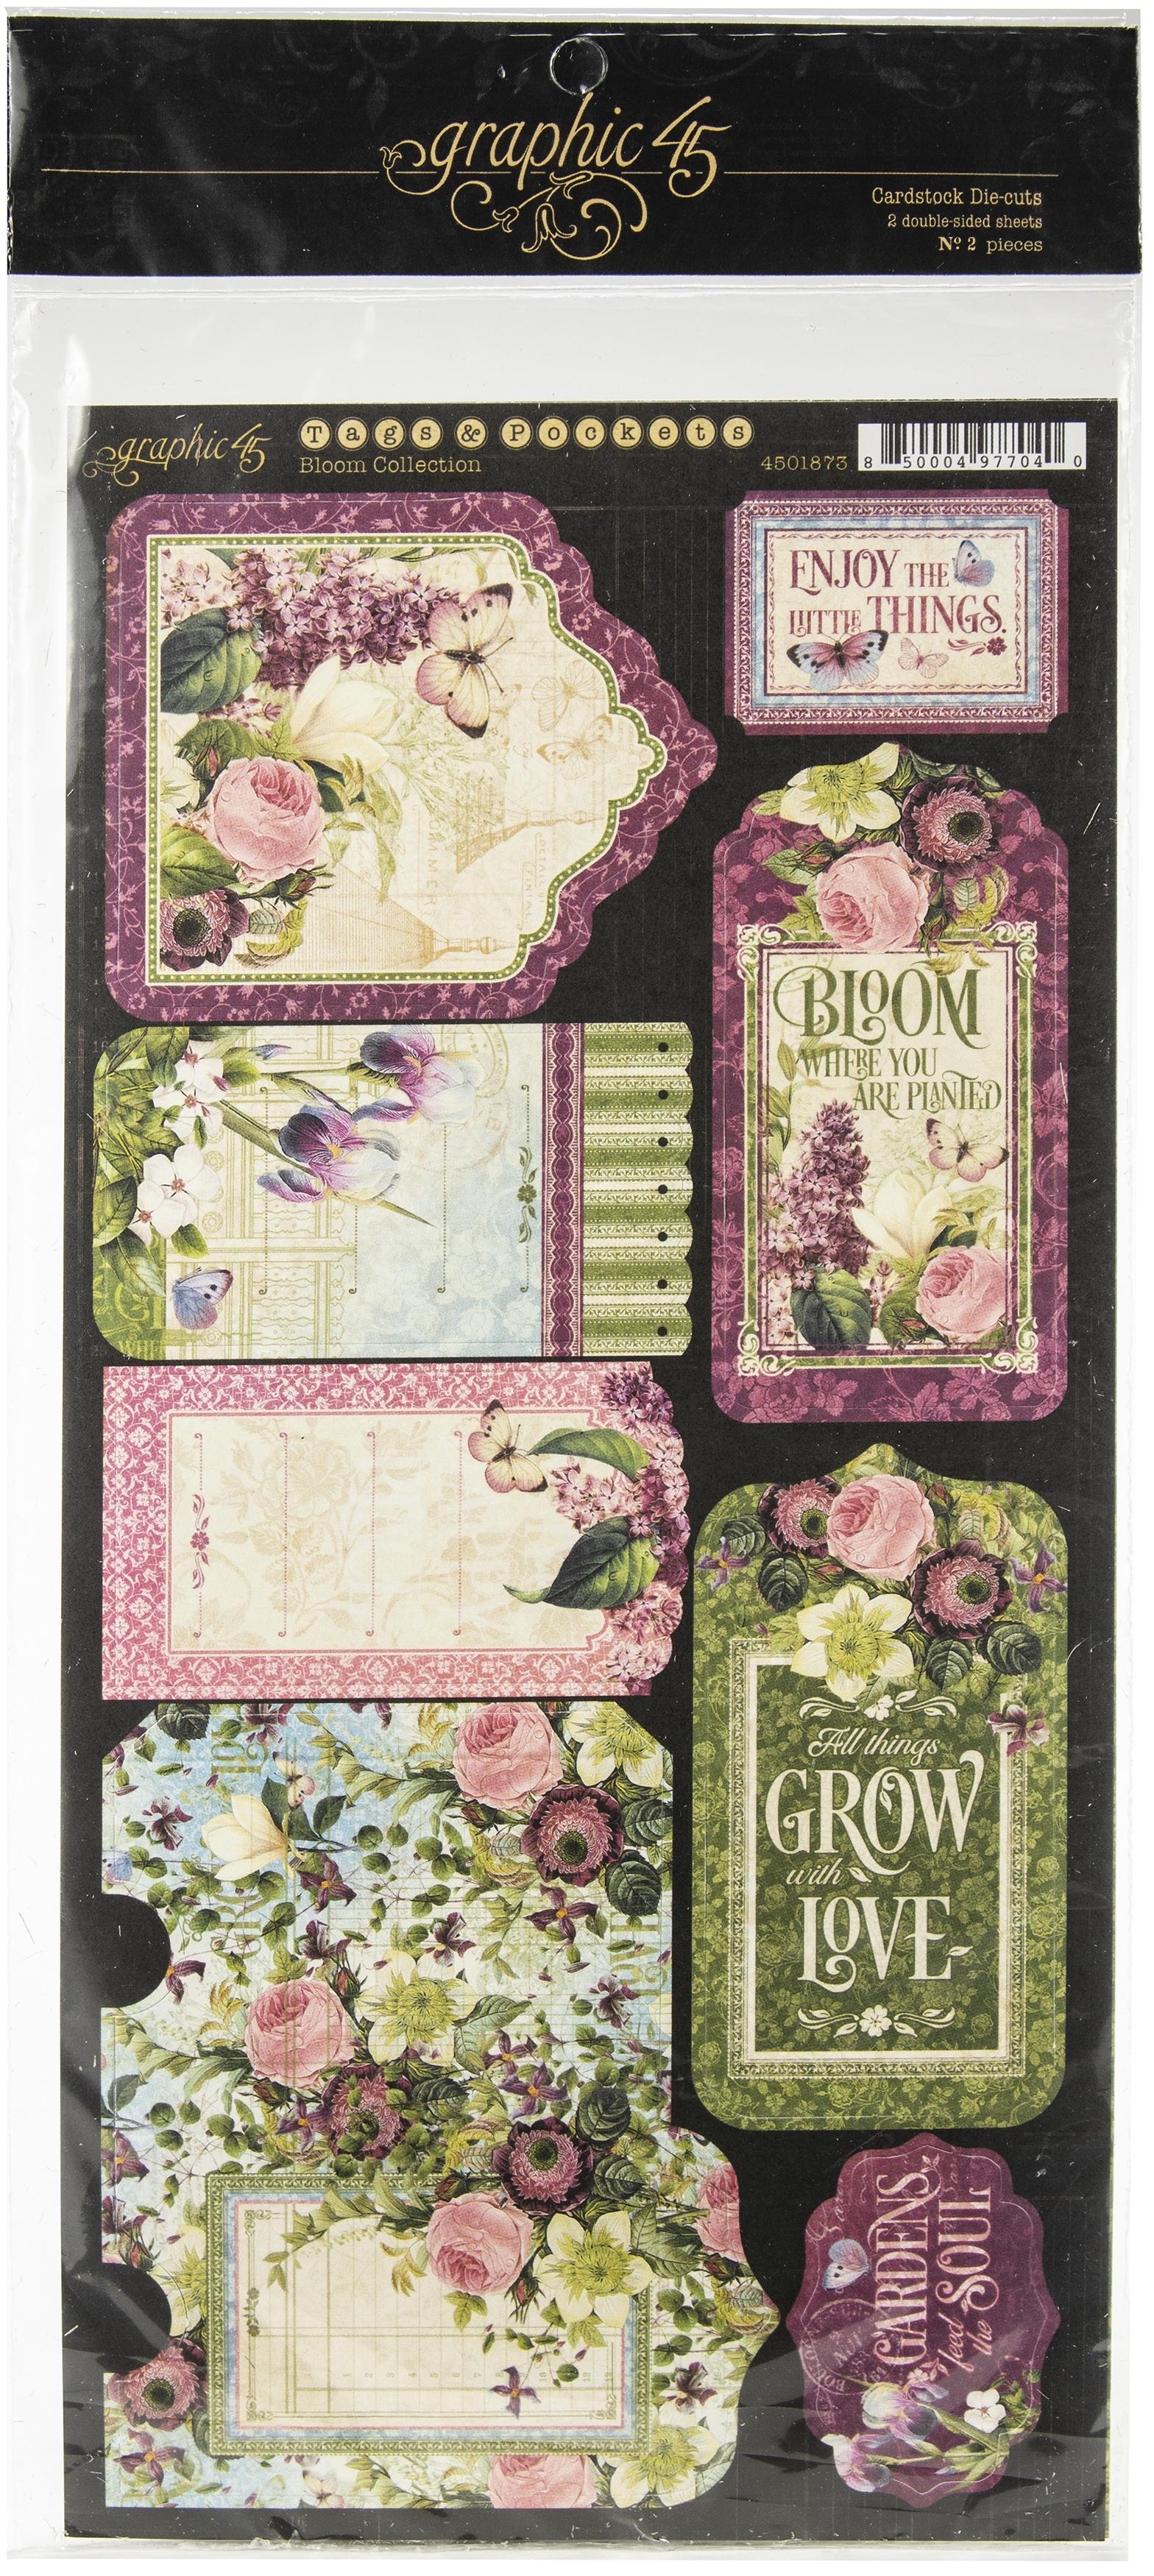 Bloom Cardstock Die-Cuts 6X12 Sheets 2/Pkg-Tags & Pockets